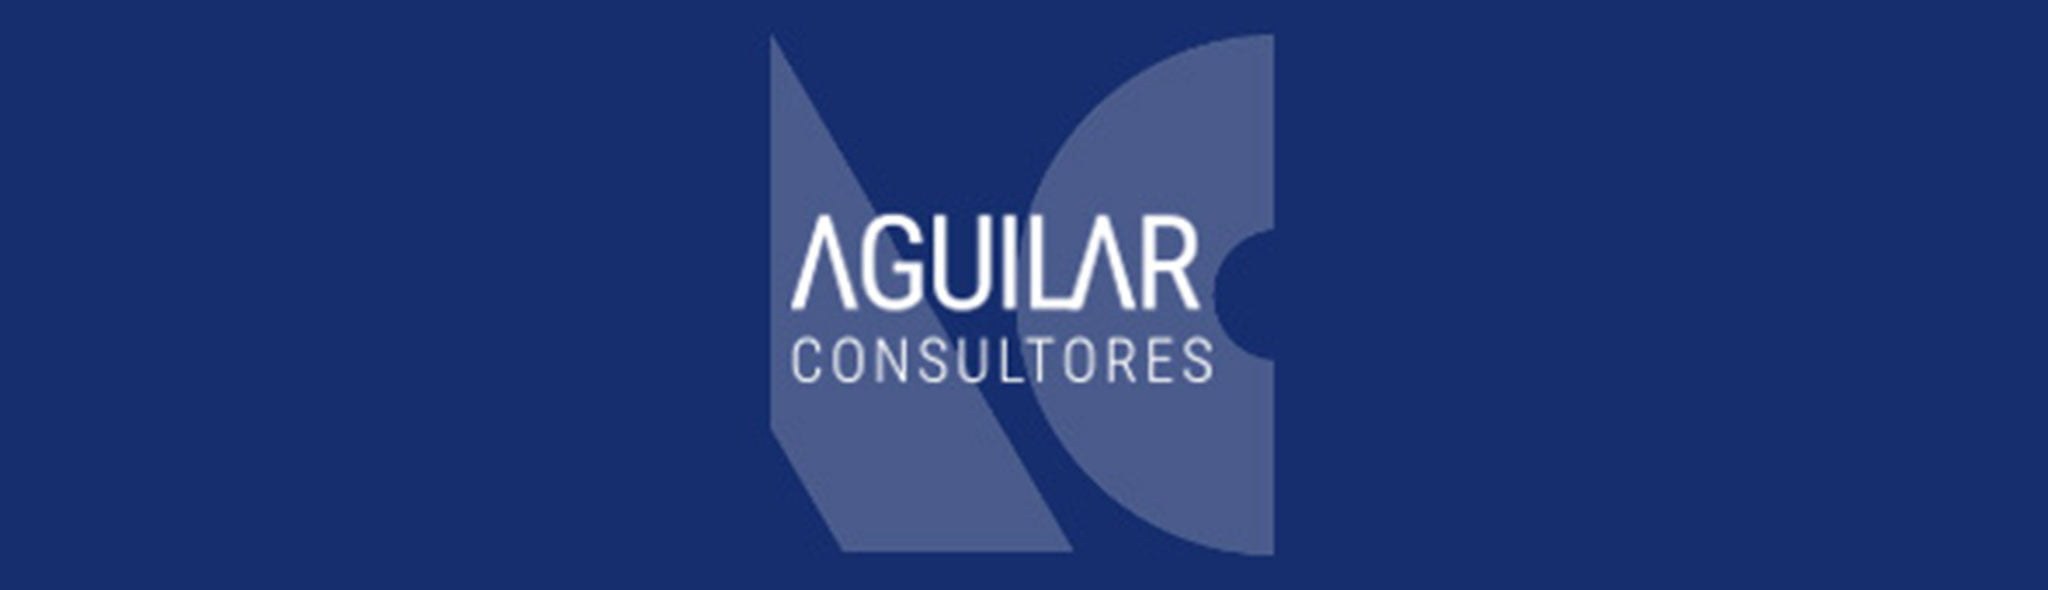 Aguilar Consultores logo